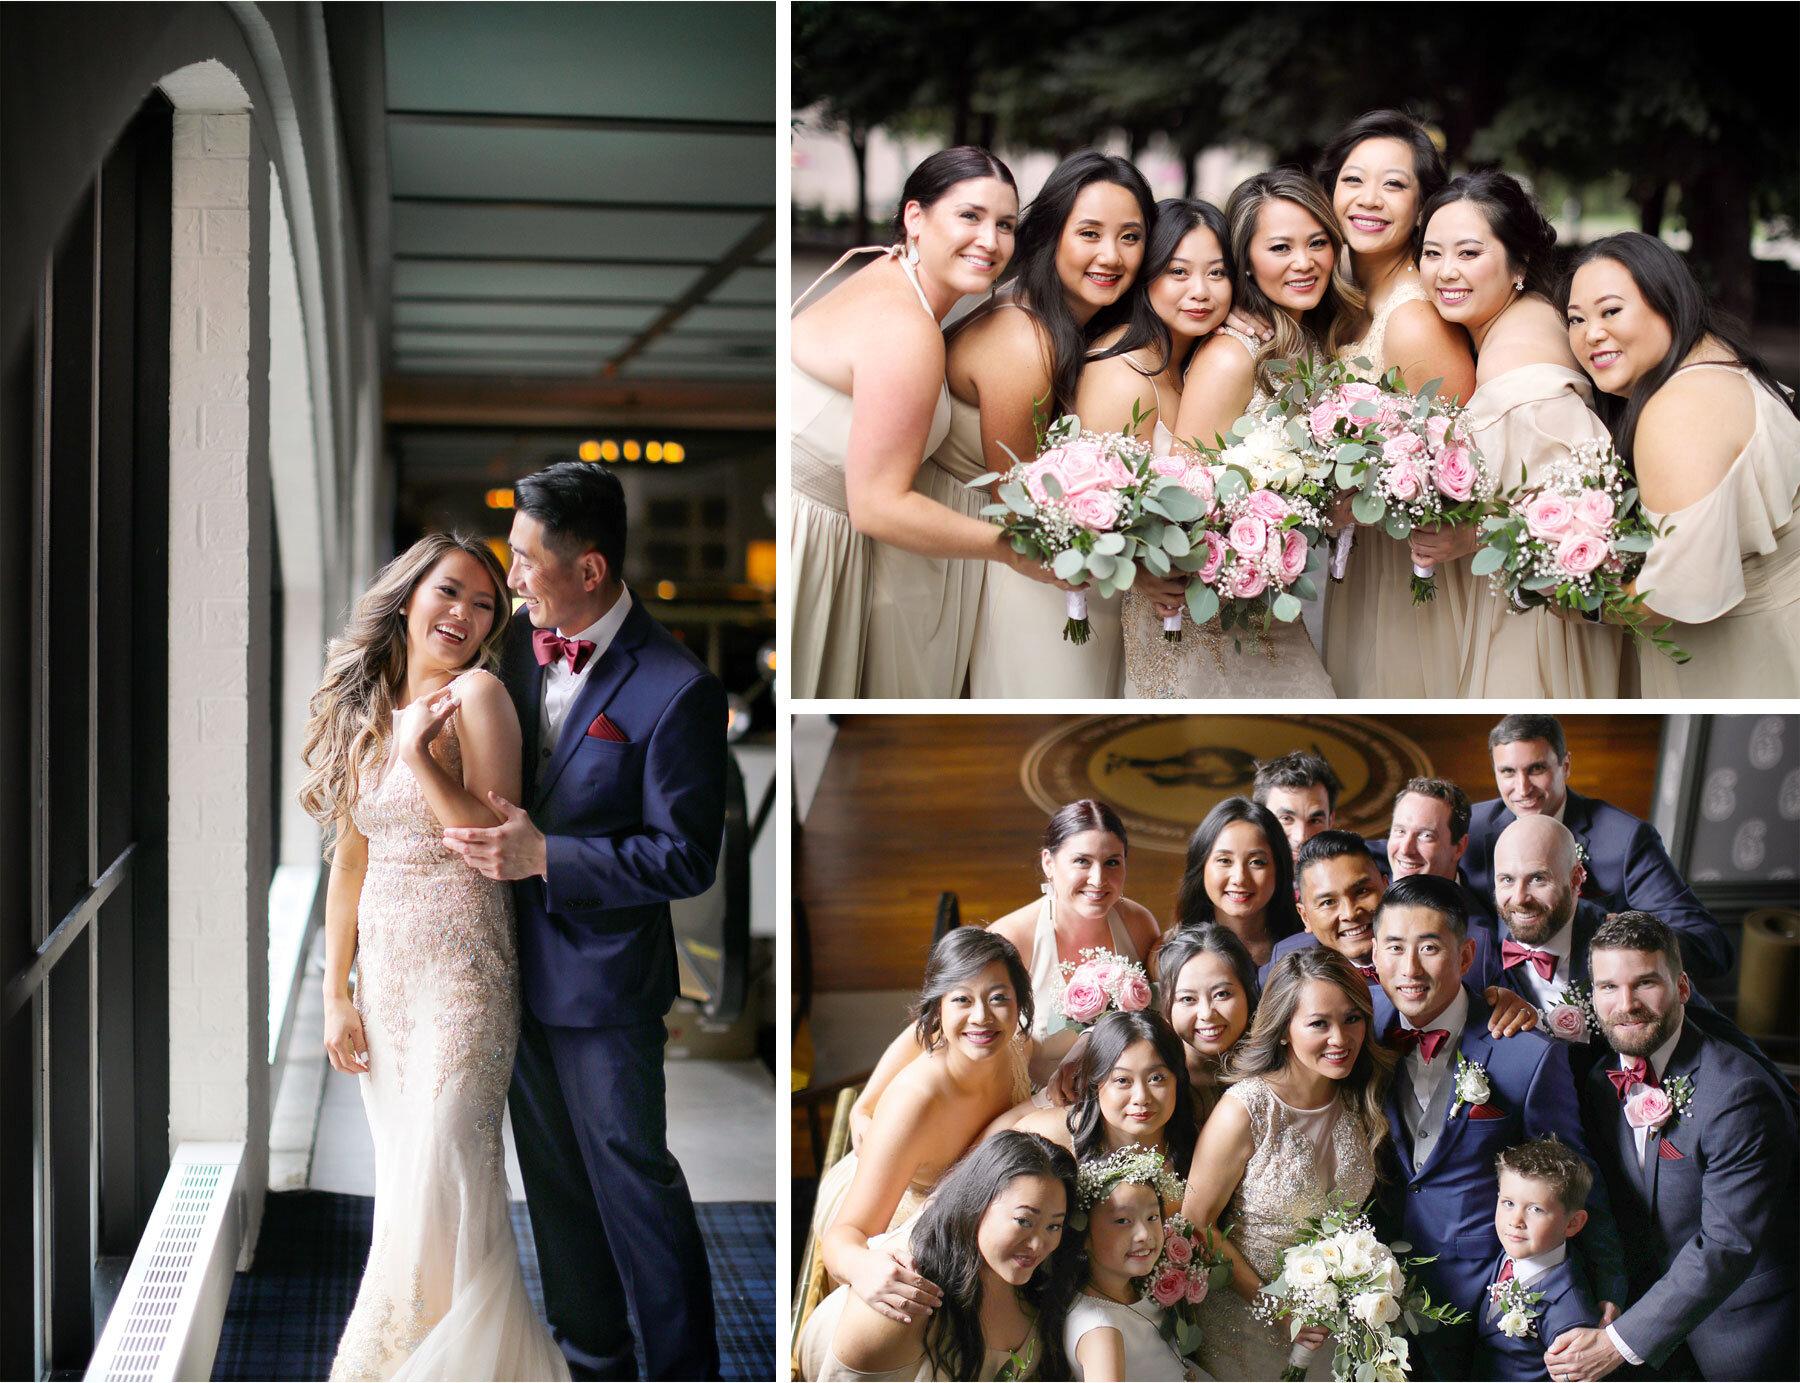 06-Vick-Photography-Minneapolis-Minnesota-The-Graduate-Lobby-Hotel-Bride-Bridesmaids-Groom-Groomsmen-Mai-&-Ross.jpg